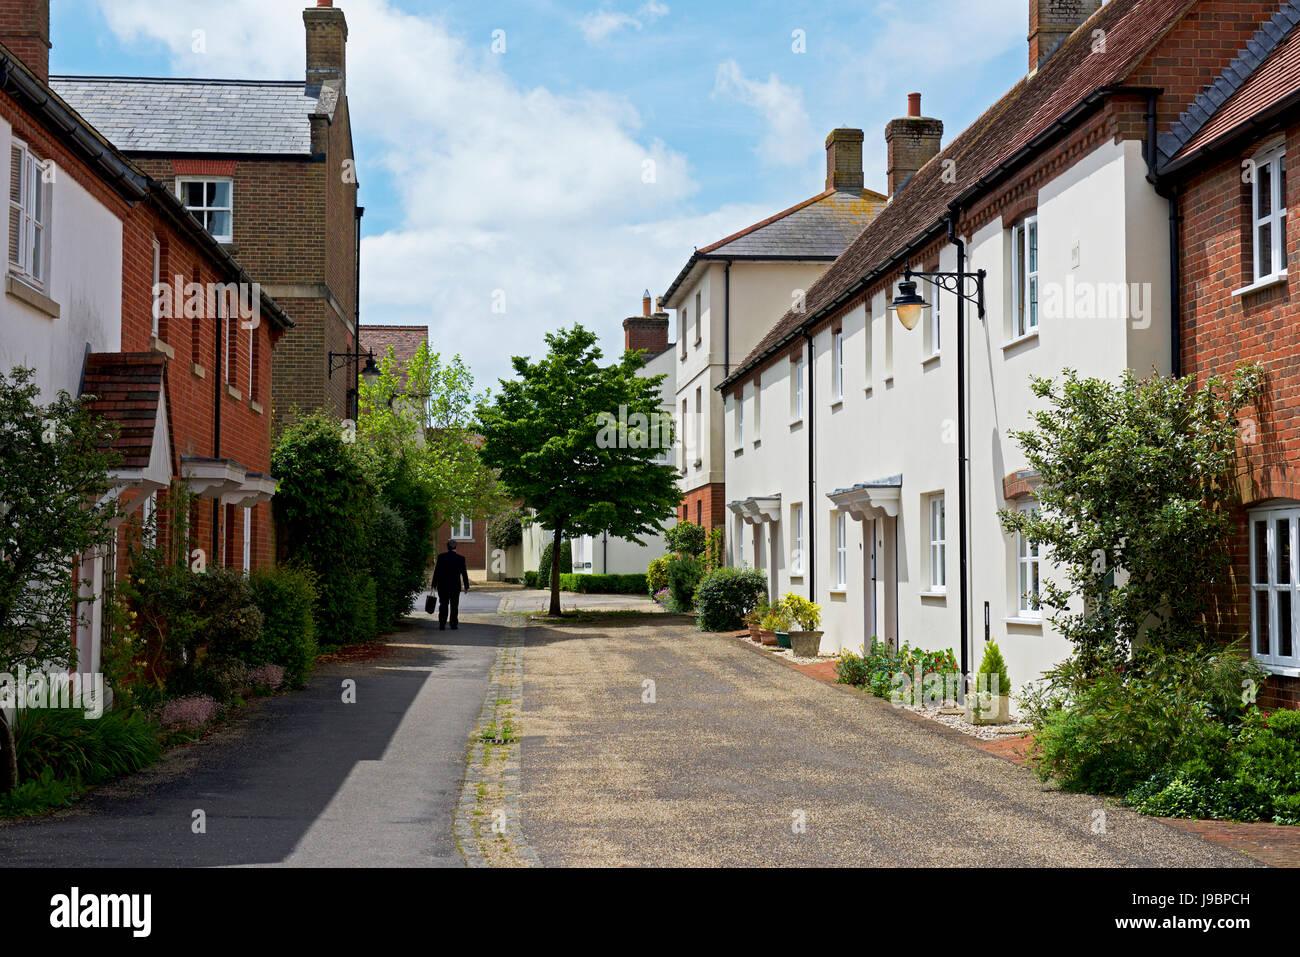 poundbury-dorset-england-uk-J9BPCH.jpg